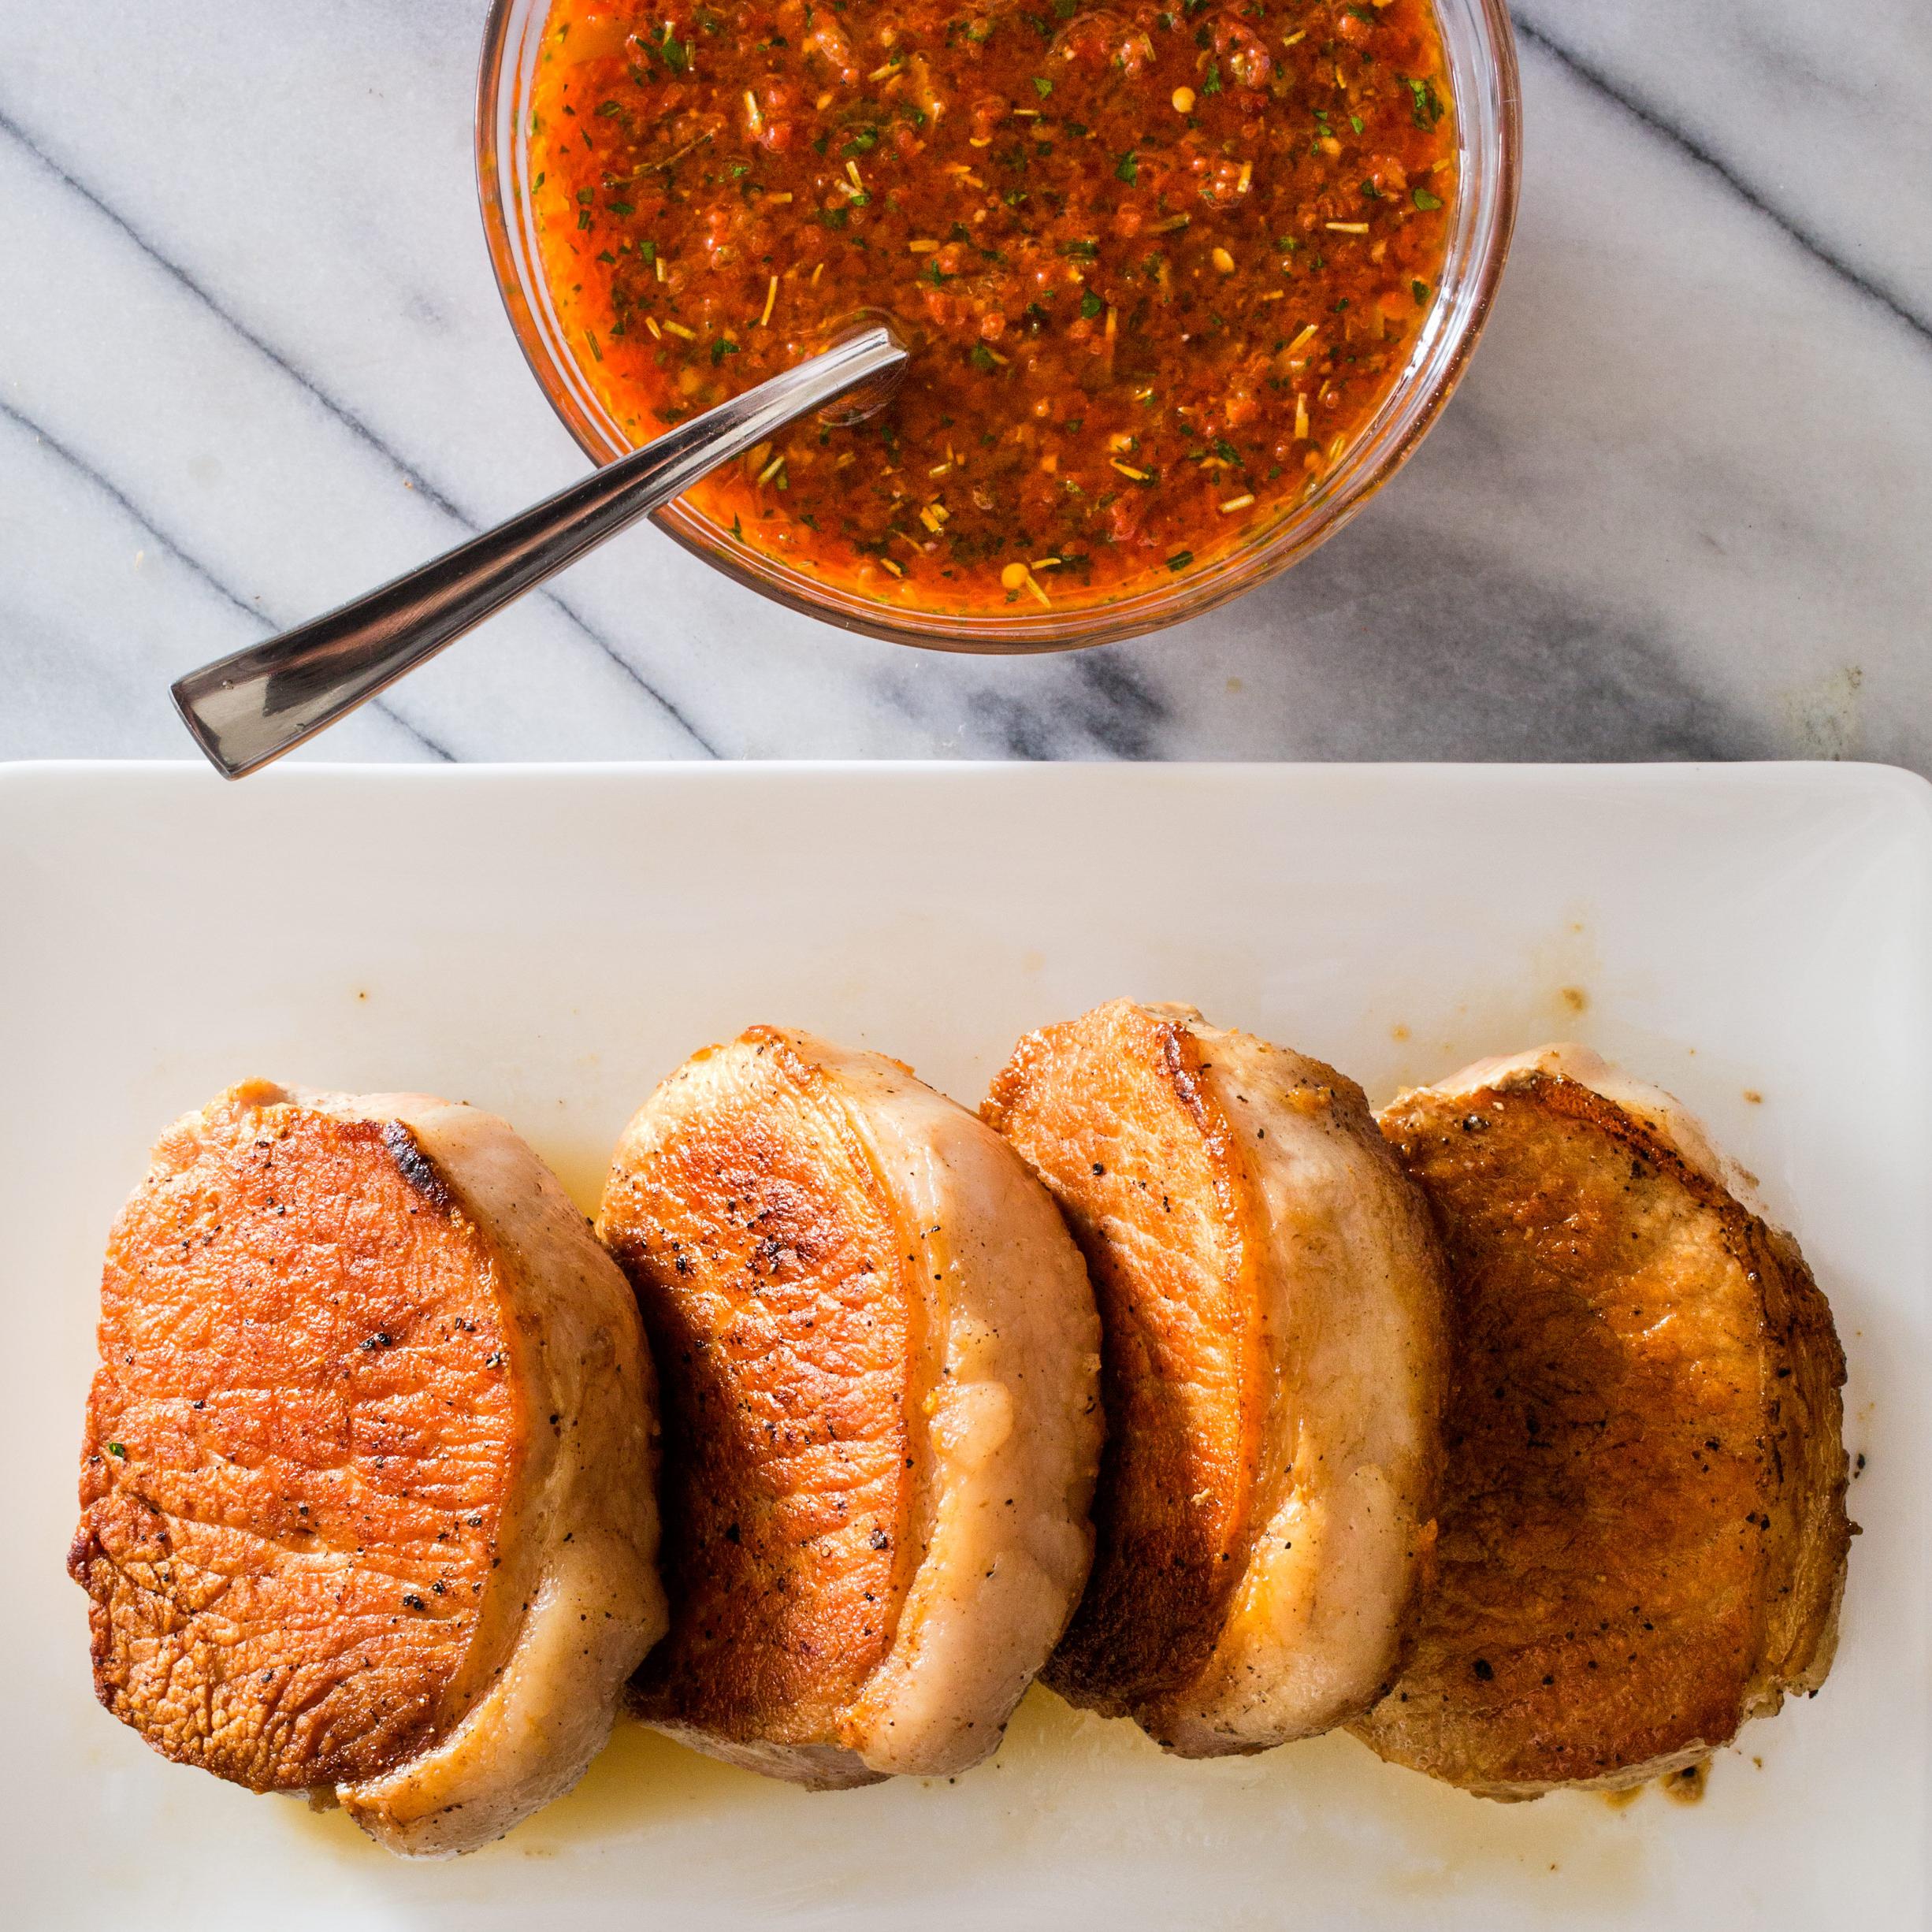 Pan Seared Thick Cut Boneless Pork Chops